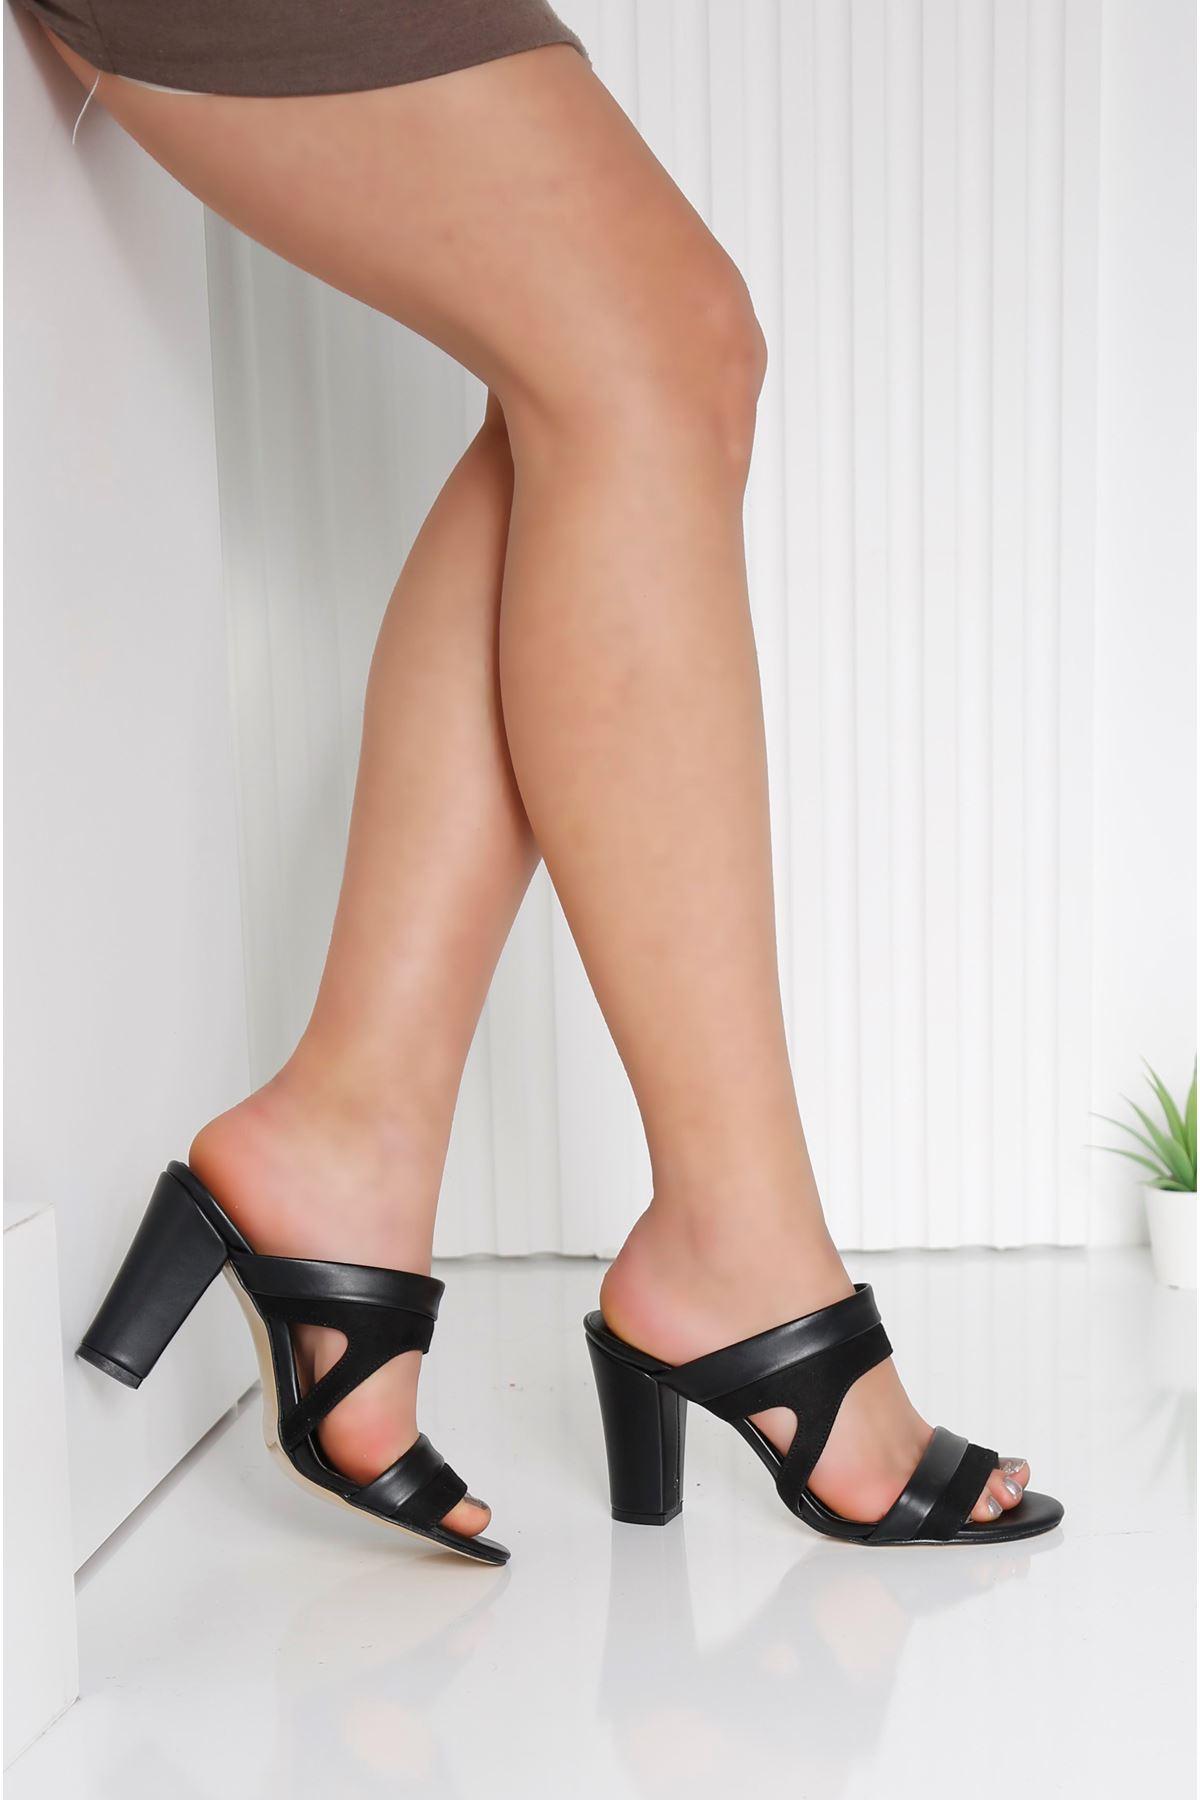 EDINA Siyah Topuklu Kadın Terlik